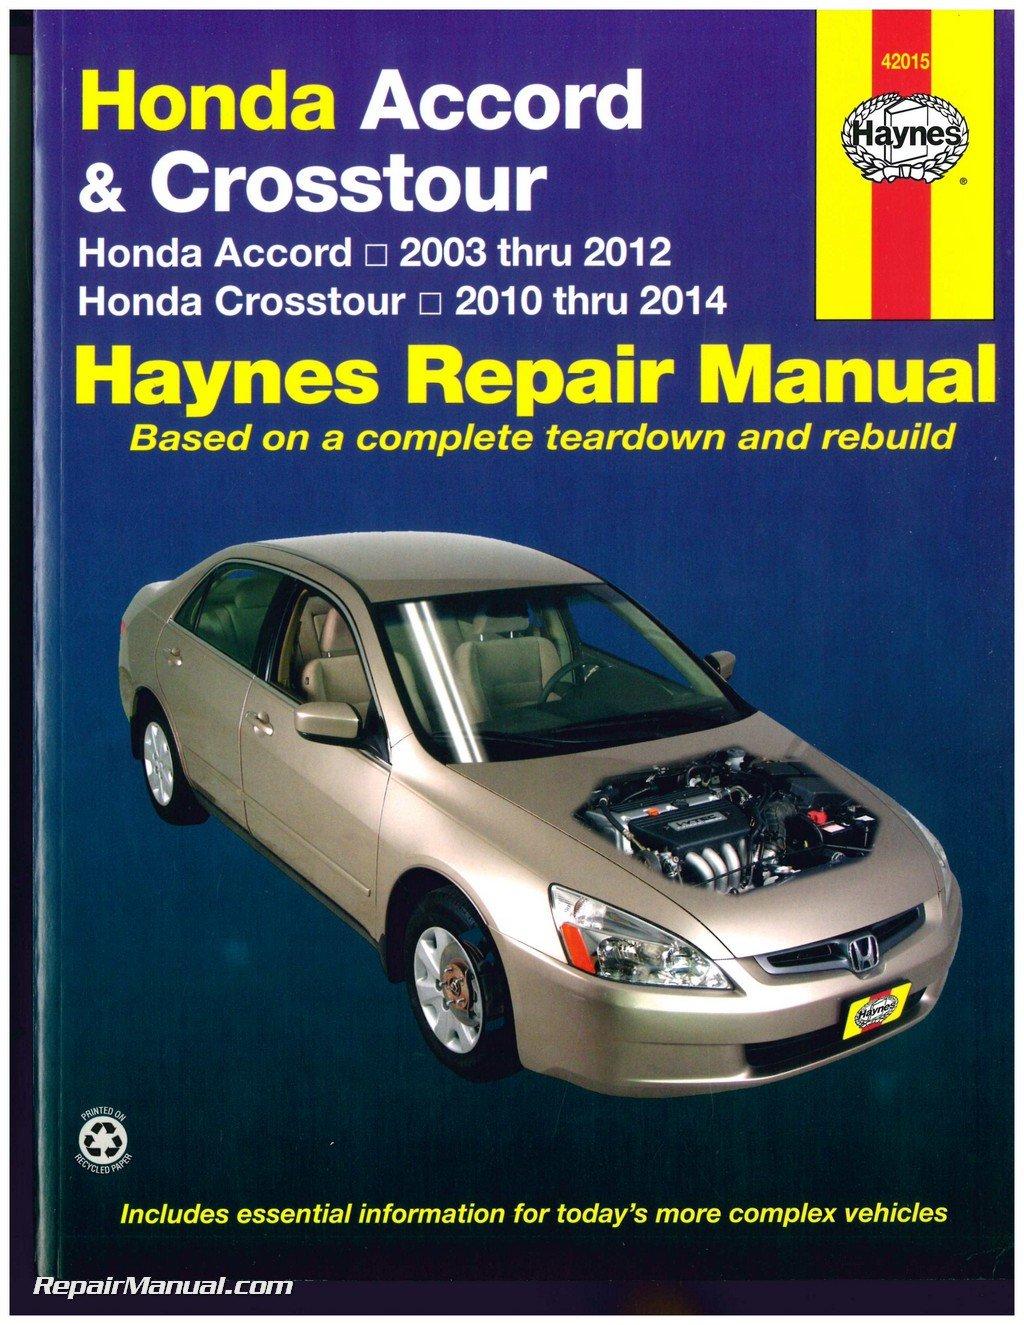 h42015 honda accord 2003 2012 crosstour 2010 2014 haynes automotive rh amazon com 2013 Honda Accord Manual 1997 Honda Accord Manual